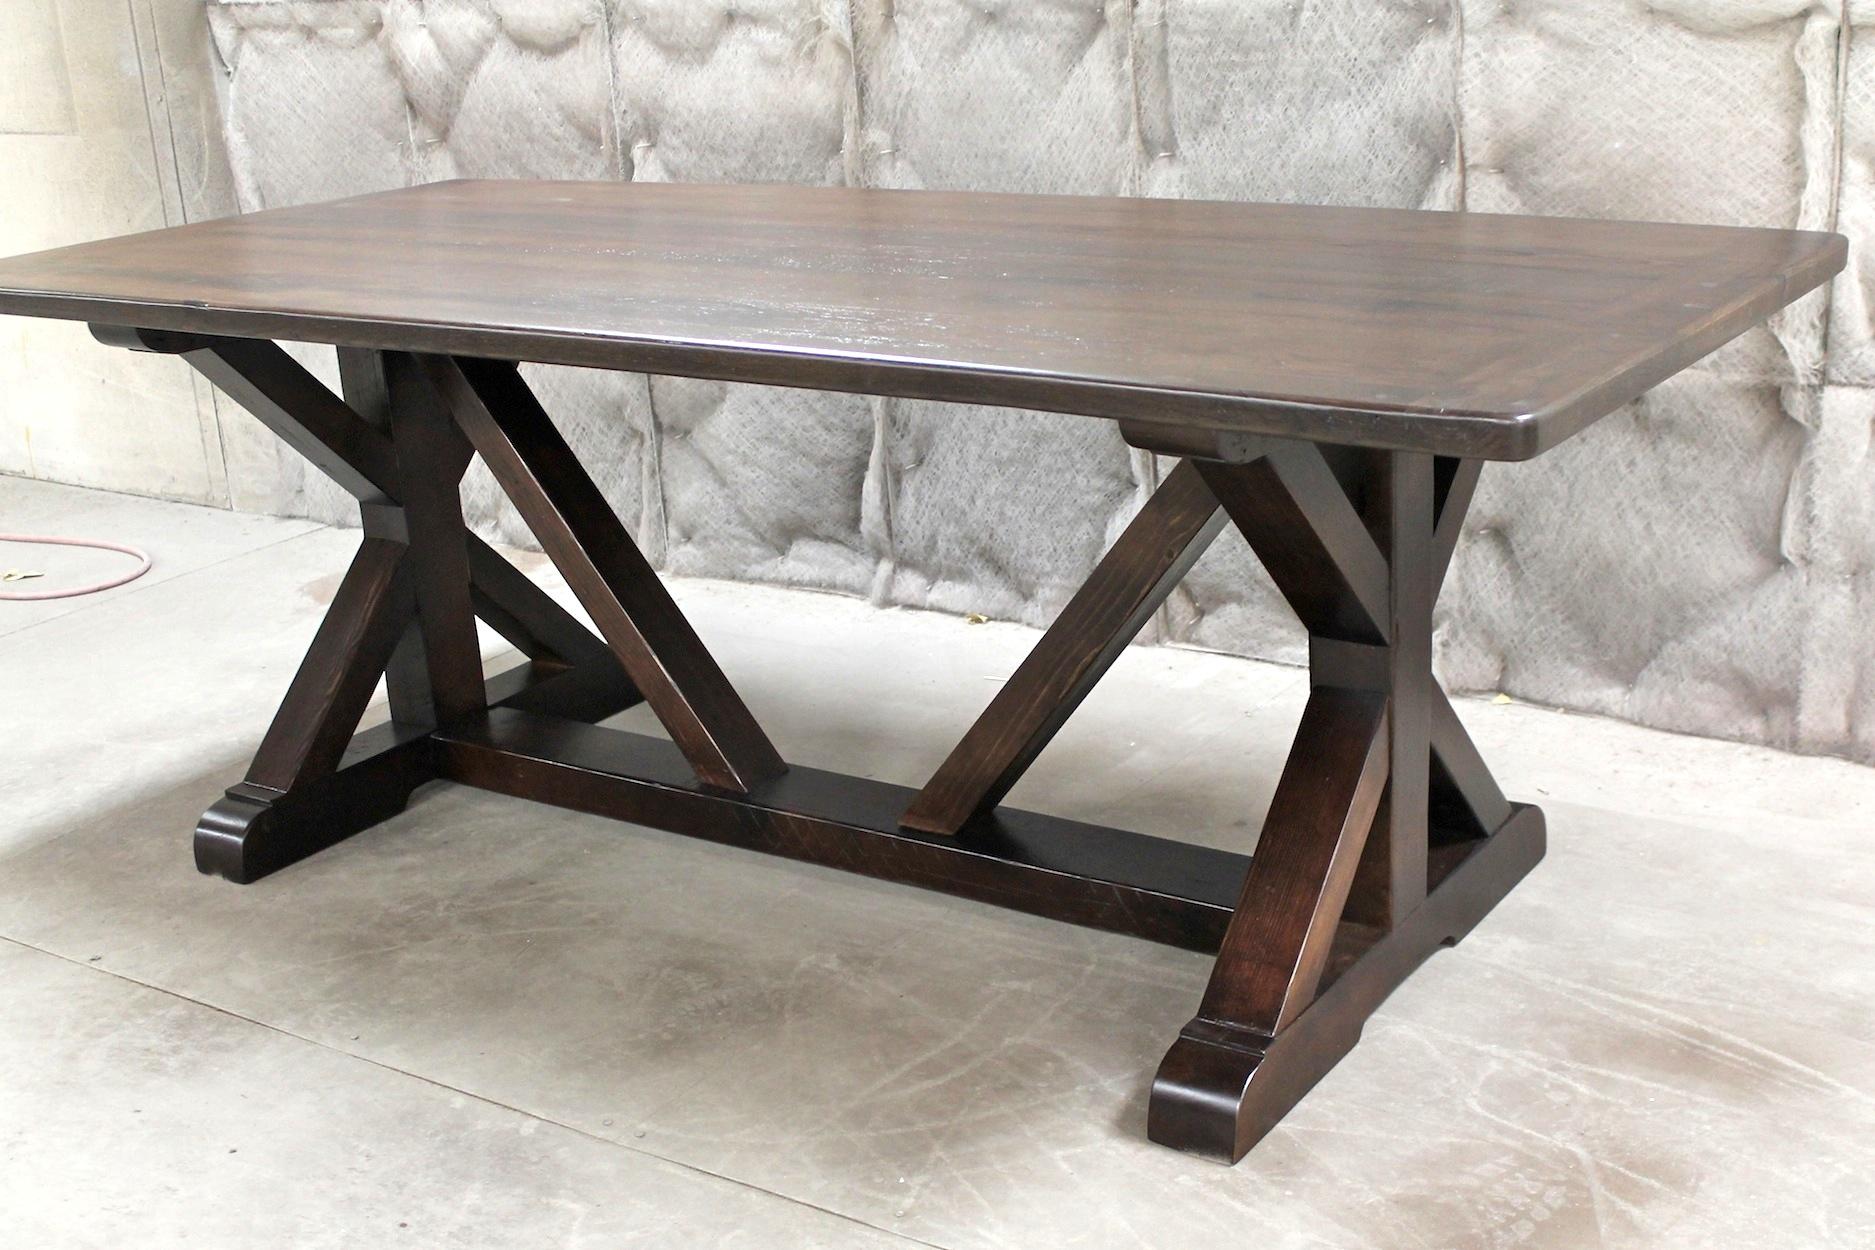 restoration hardware kitchen table light fixtures inspired x base trestle